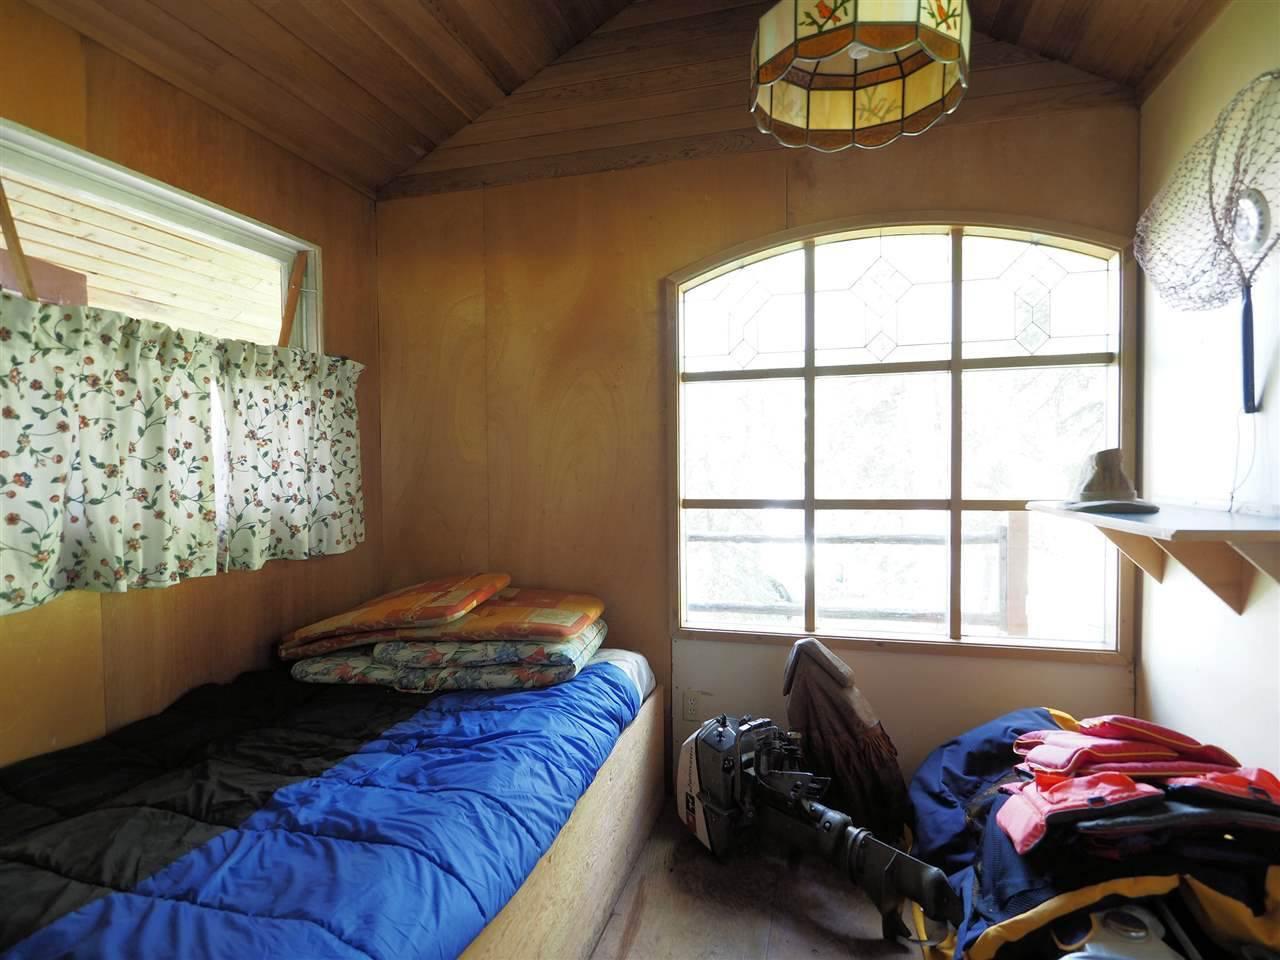 Photo 23: Photos: 8222 CENTENNIAL Road in Bridge Lake: Bridge Lake/Sheridan Lake House for sale (100 Mile House (Zone 10))  : MLS®# R2457362